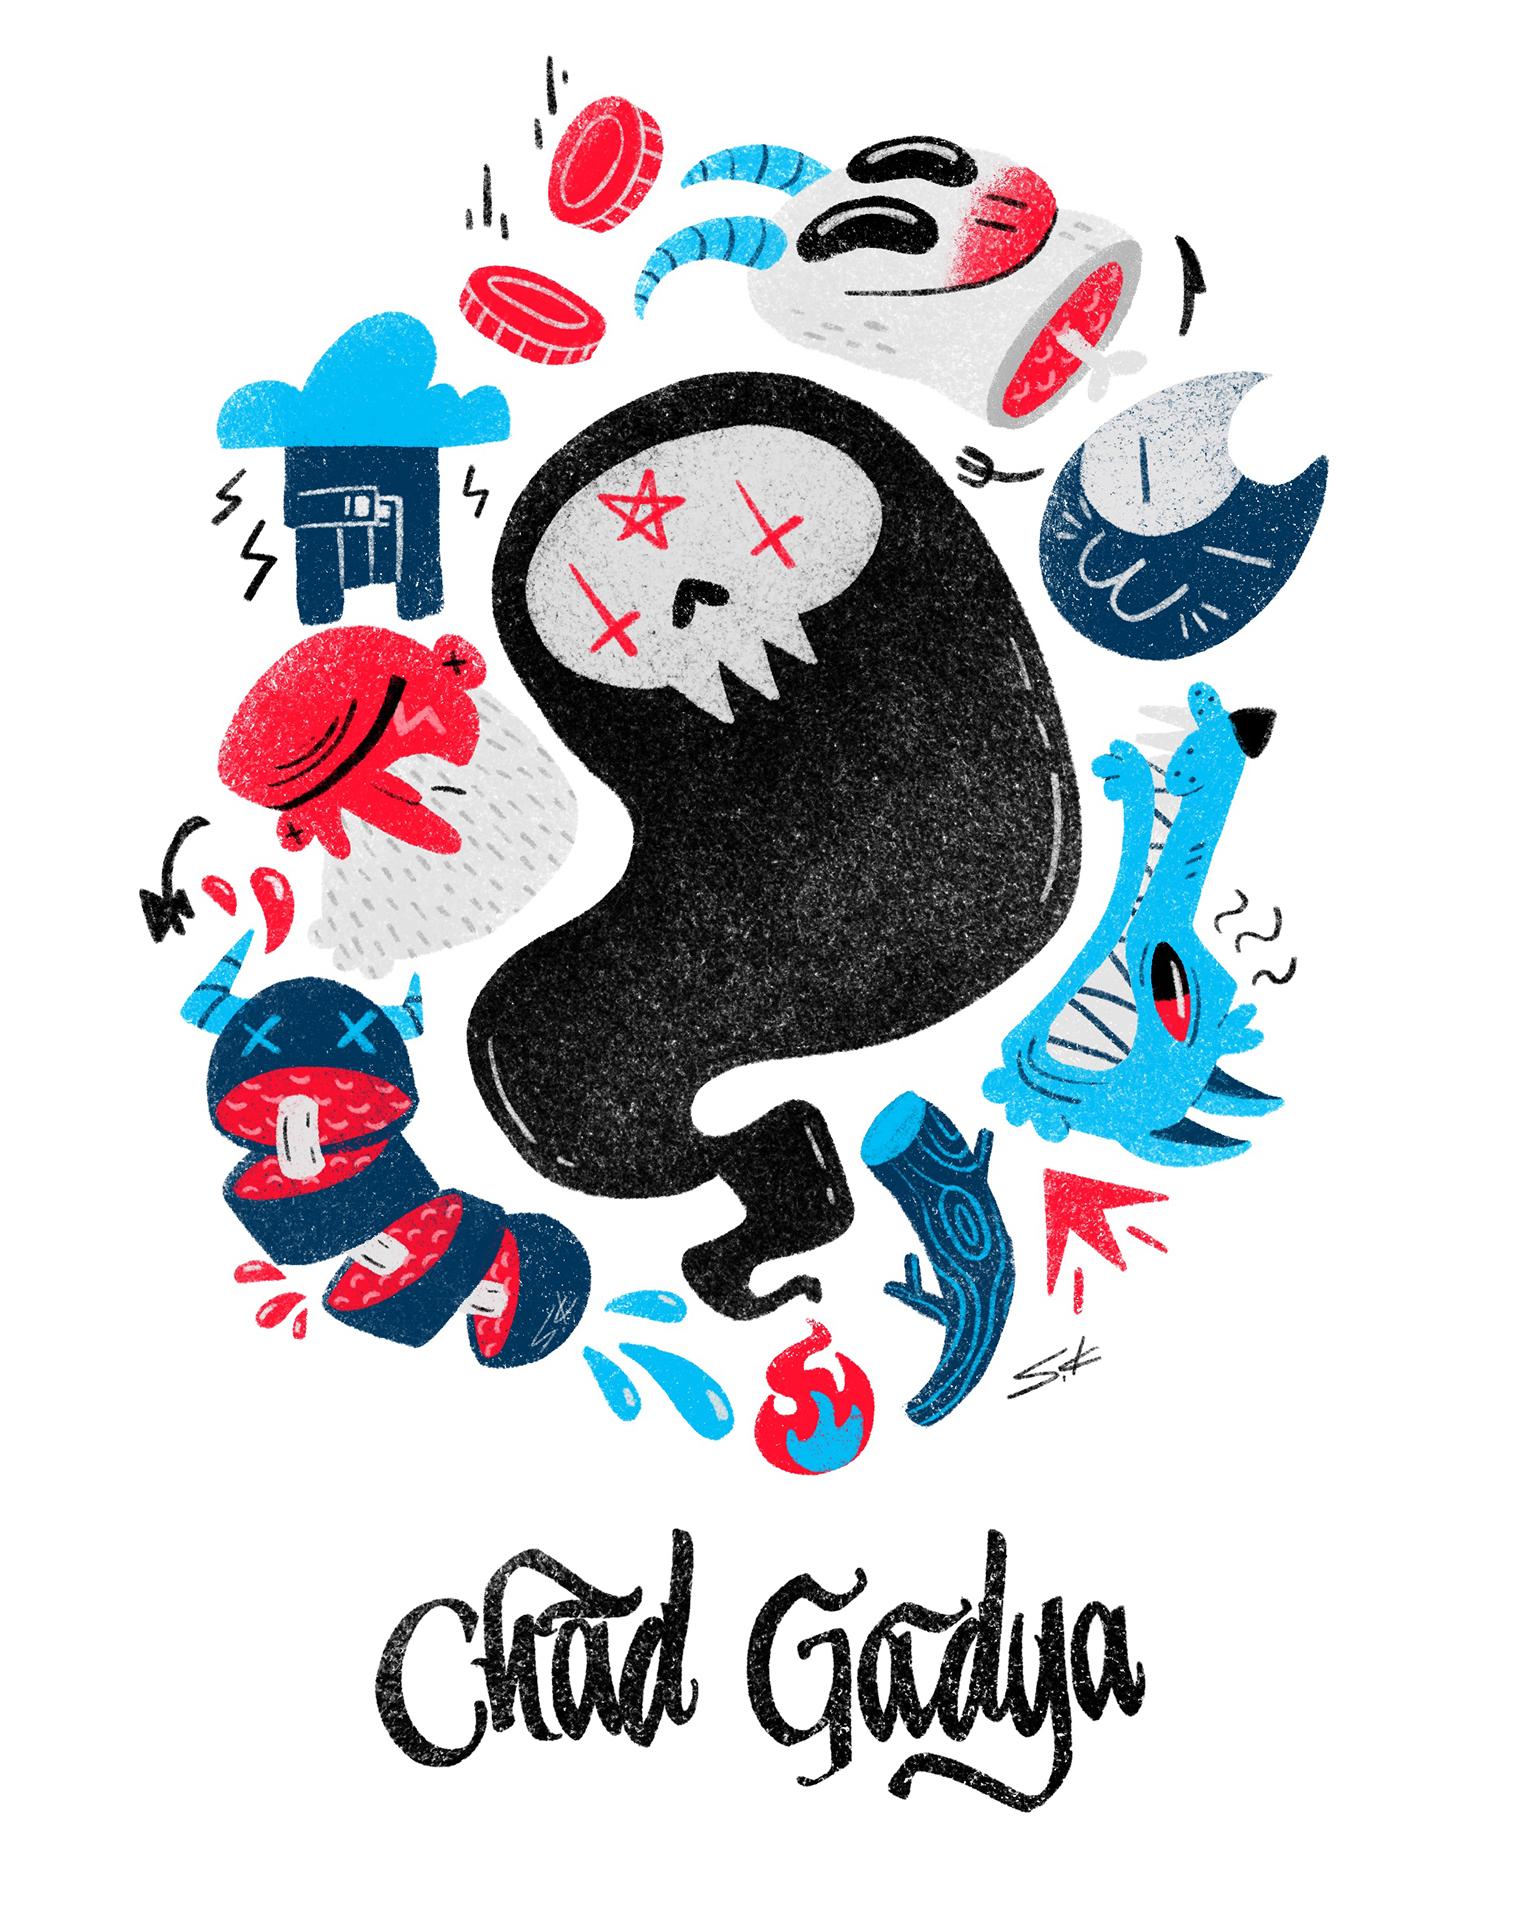 chad gadya.jpg